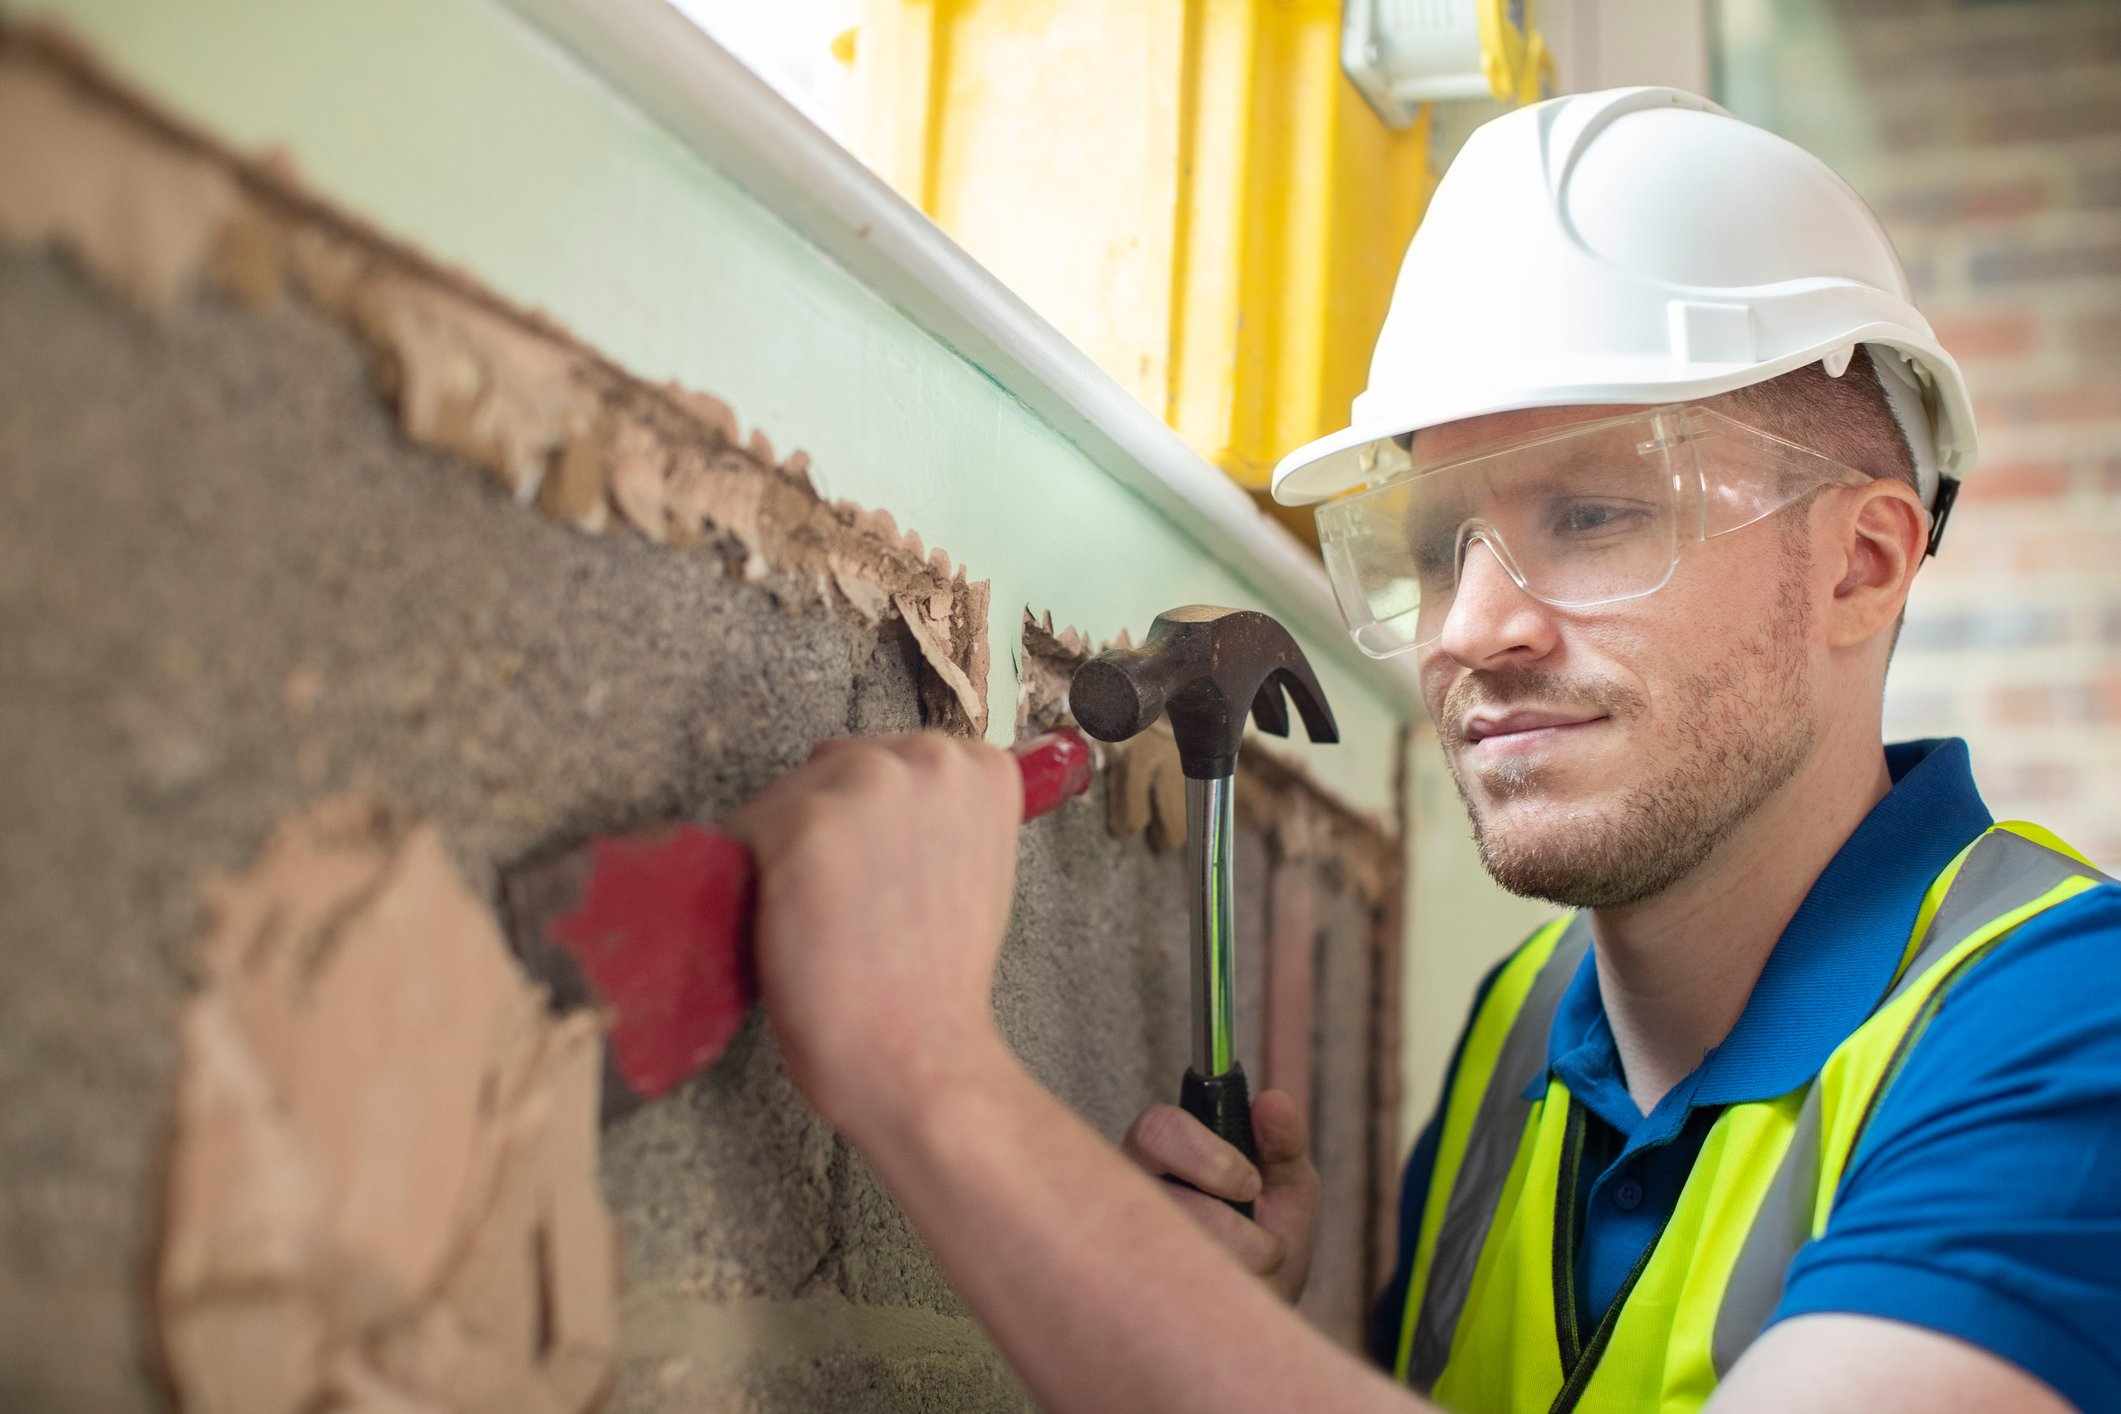 John was knocking down walls at work. |